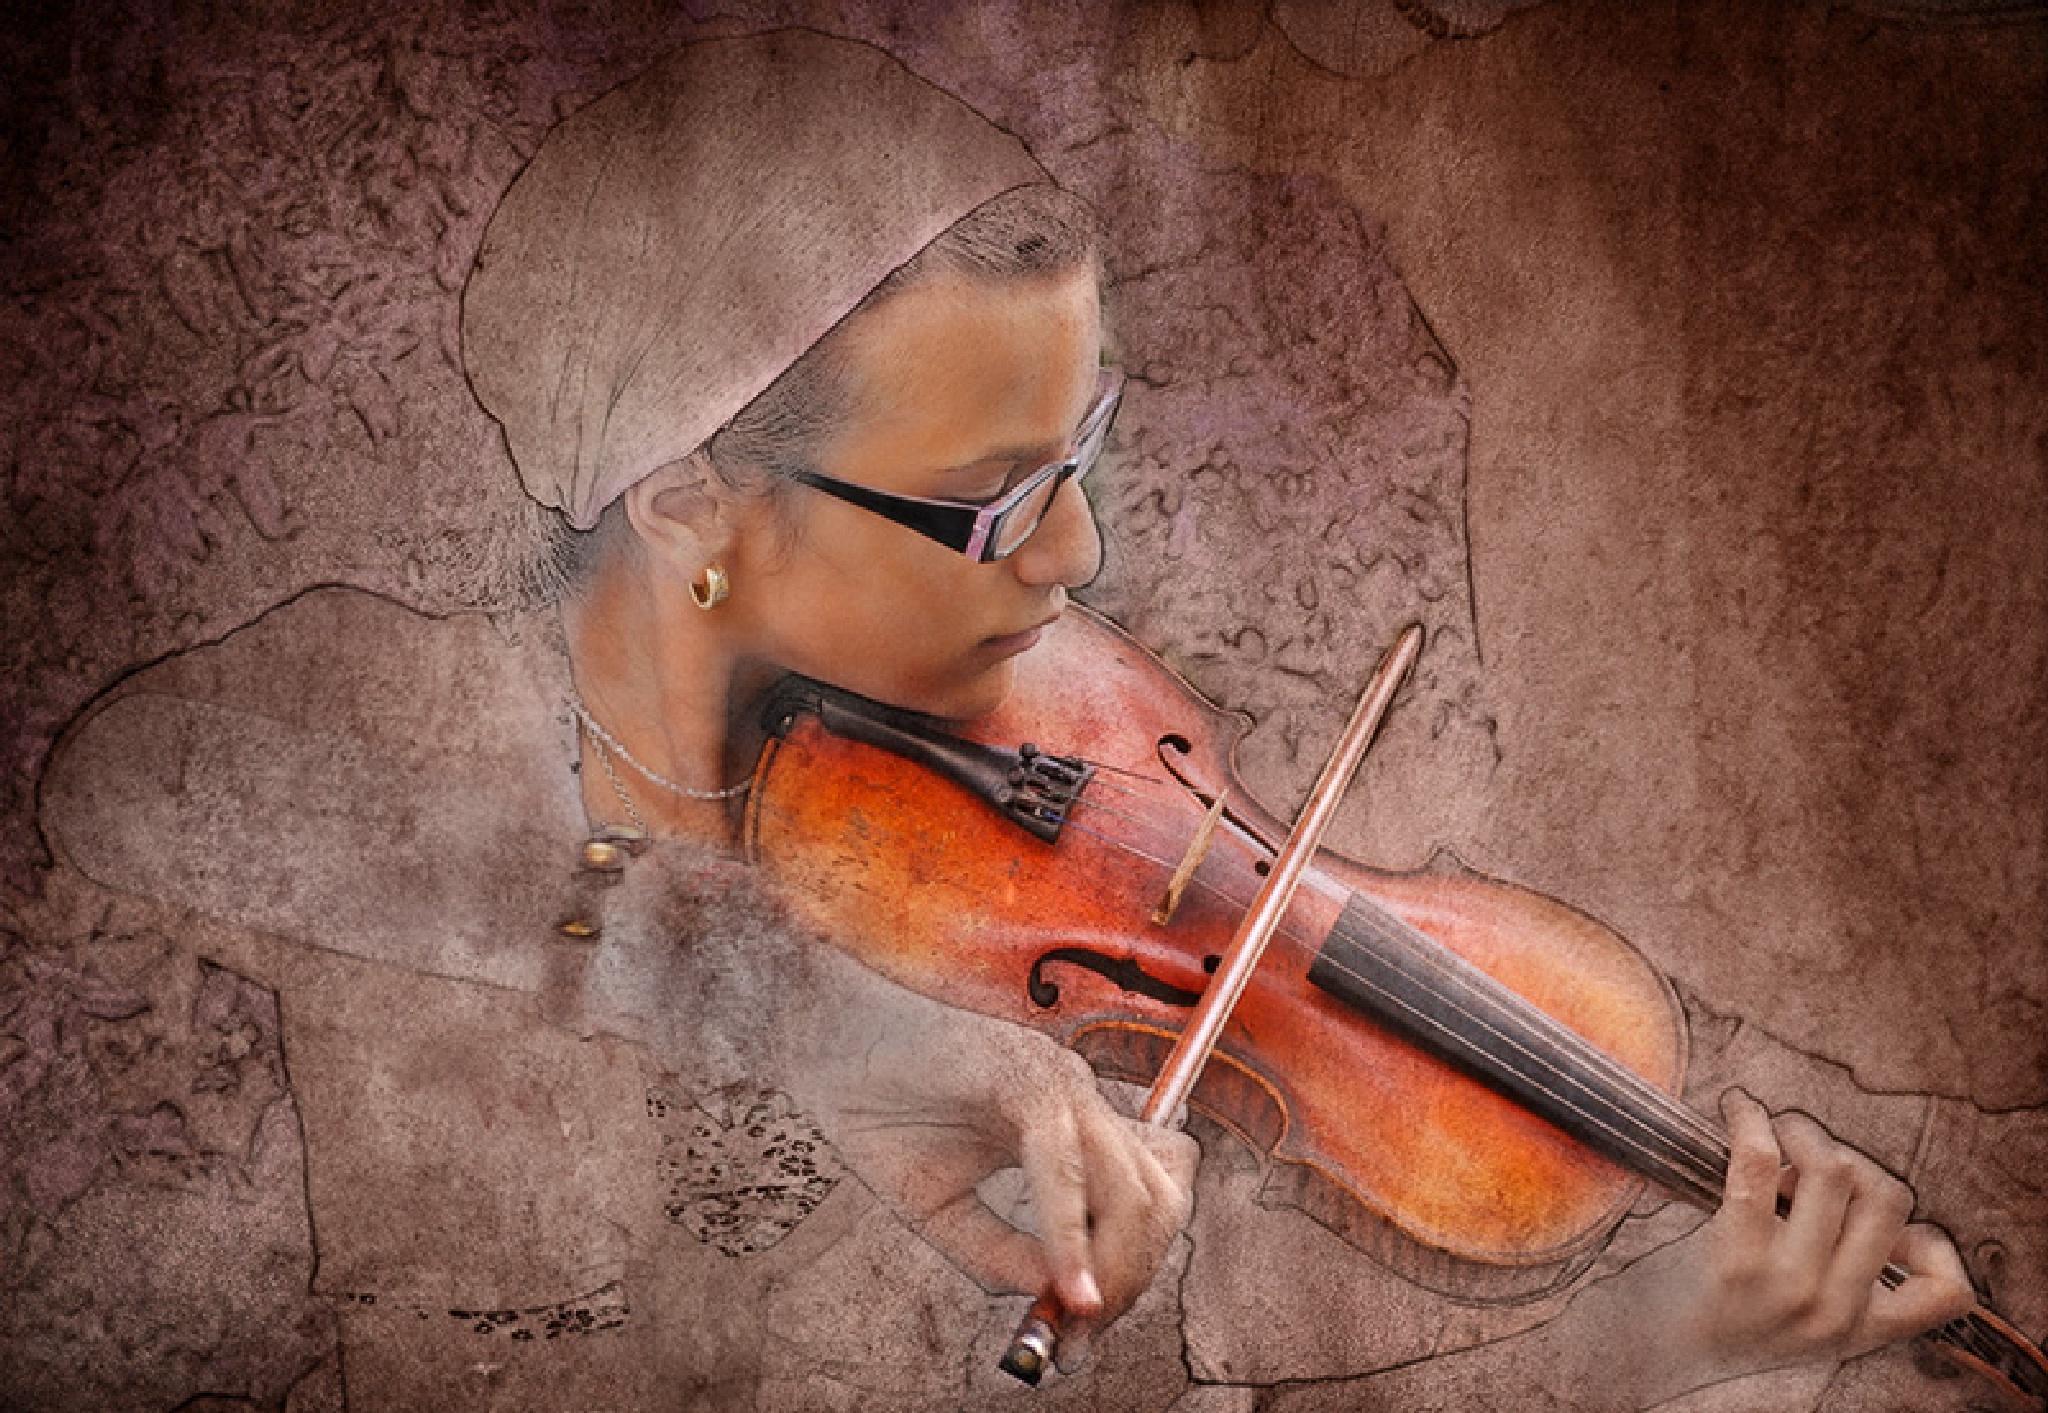 Violin by Zoran Buletic